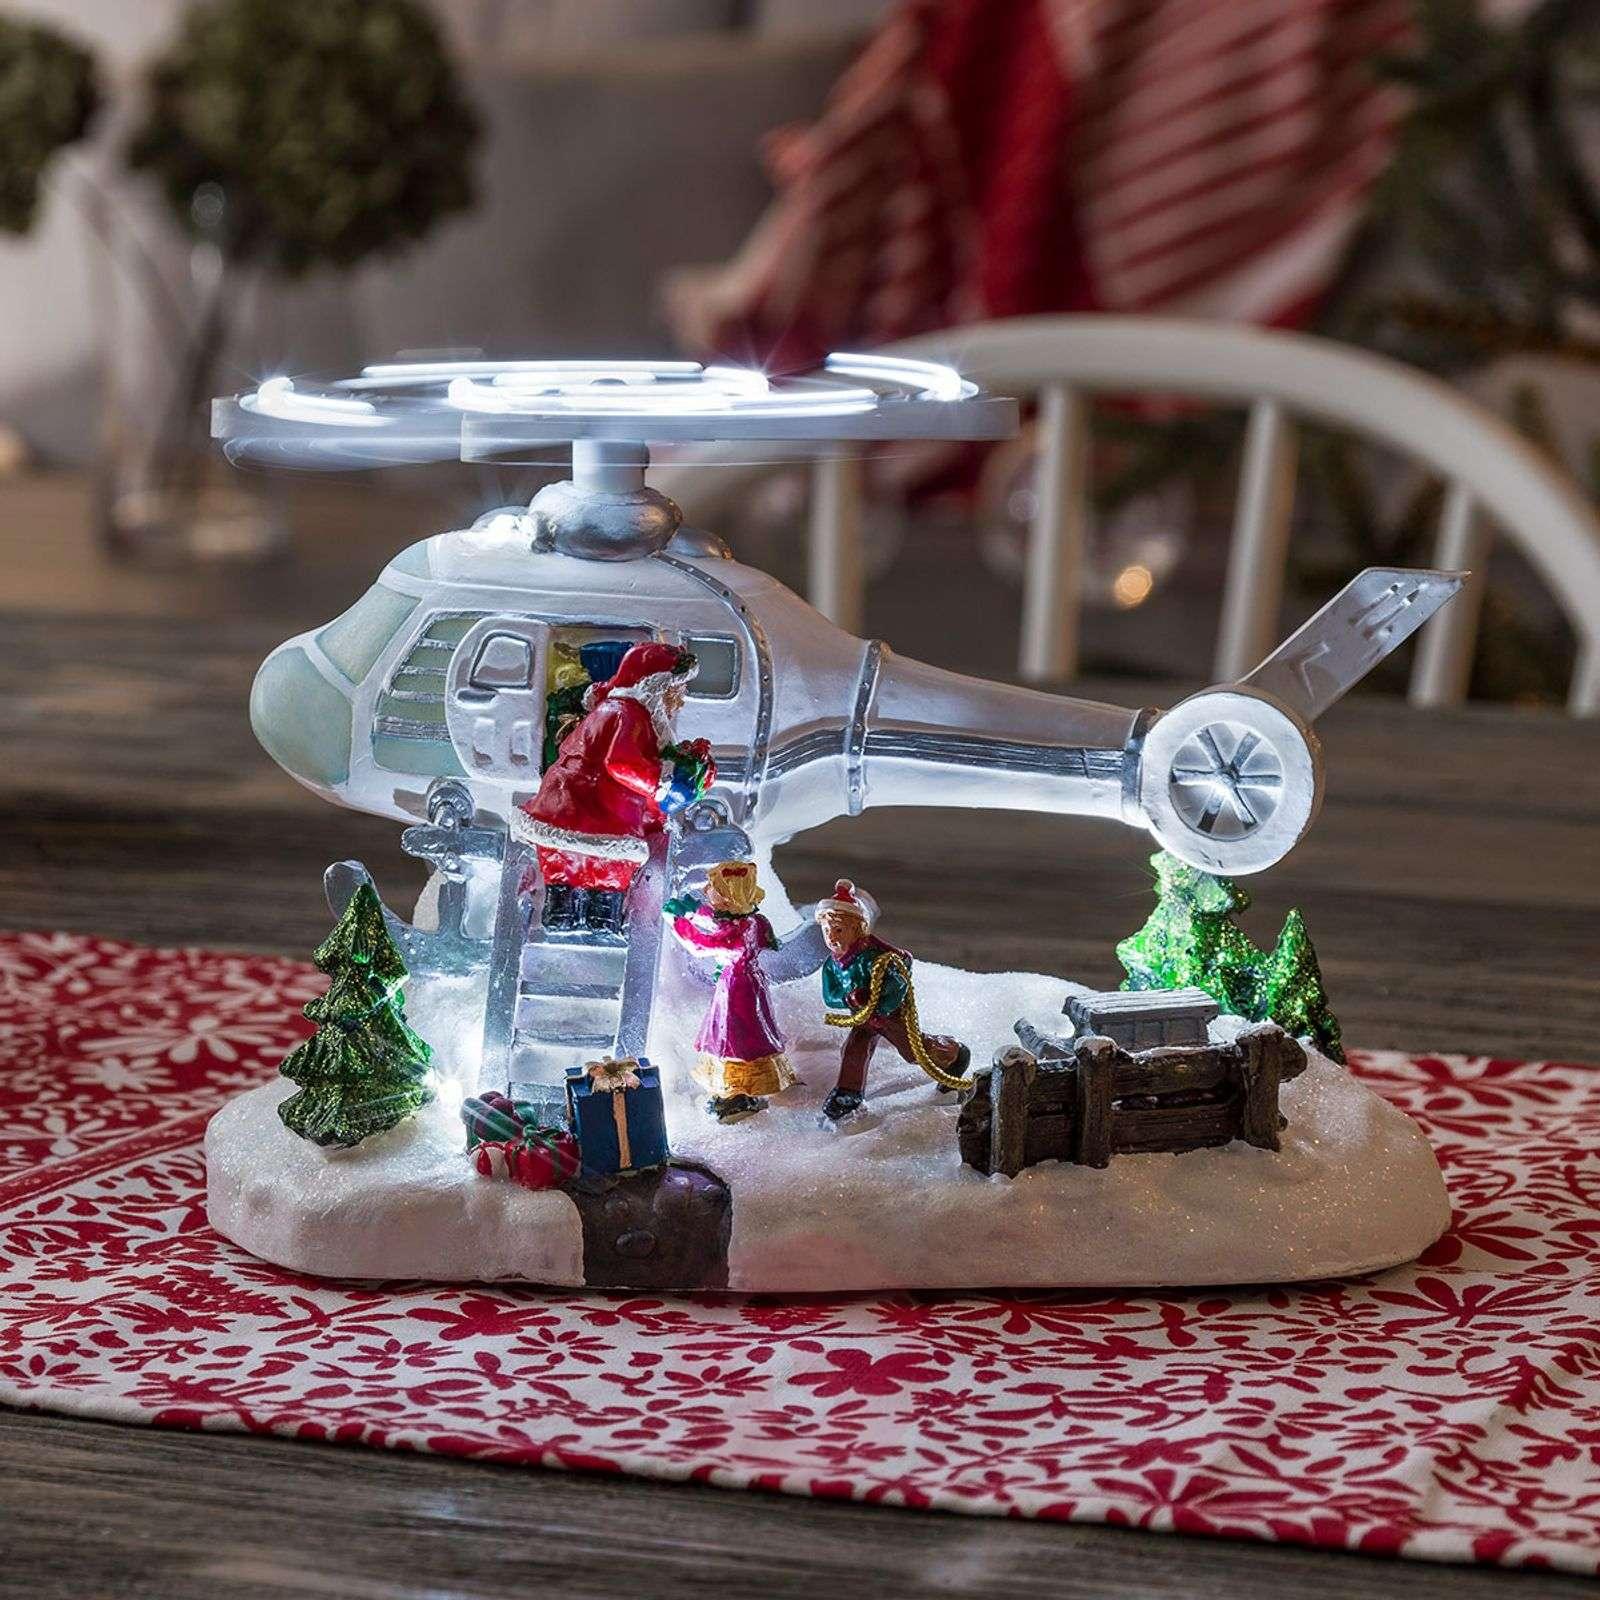 Kaunis LED-maisema helikopteri ja joulupukki-5524858-01